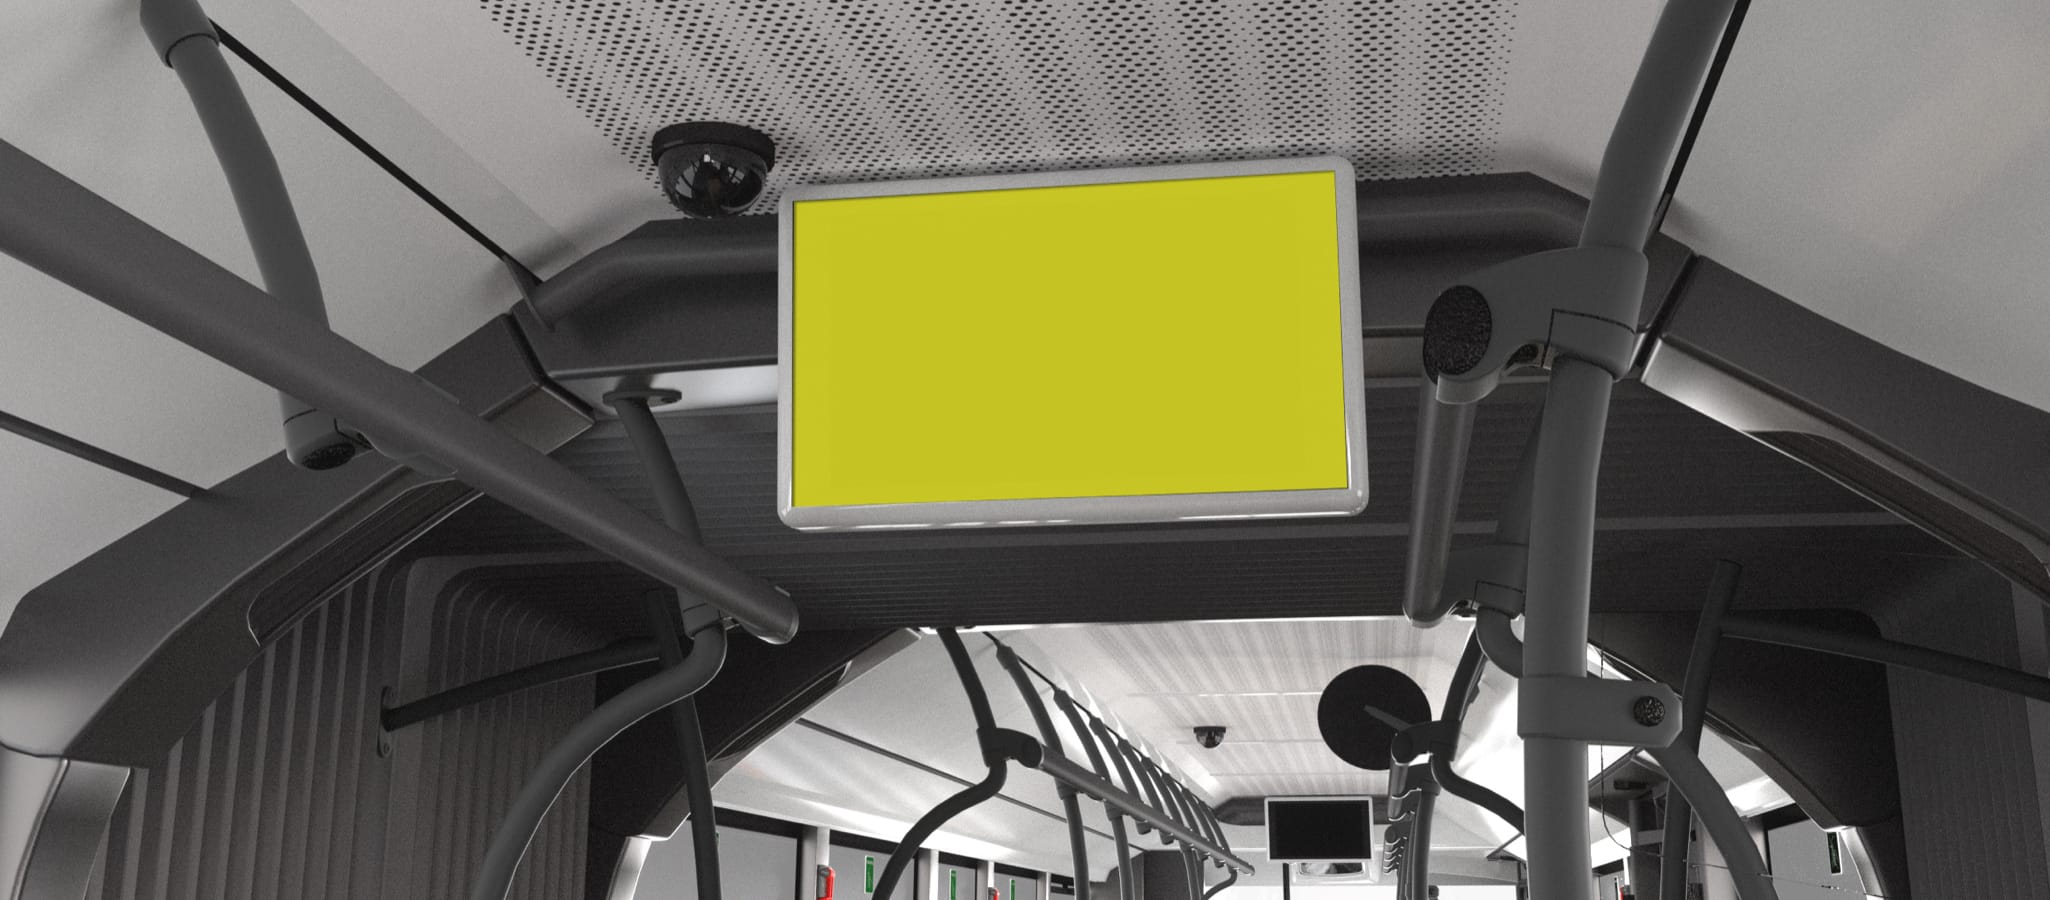 02_KWS-Buswerbung-Fahrgast-TV